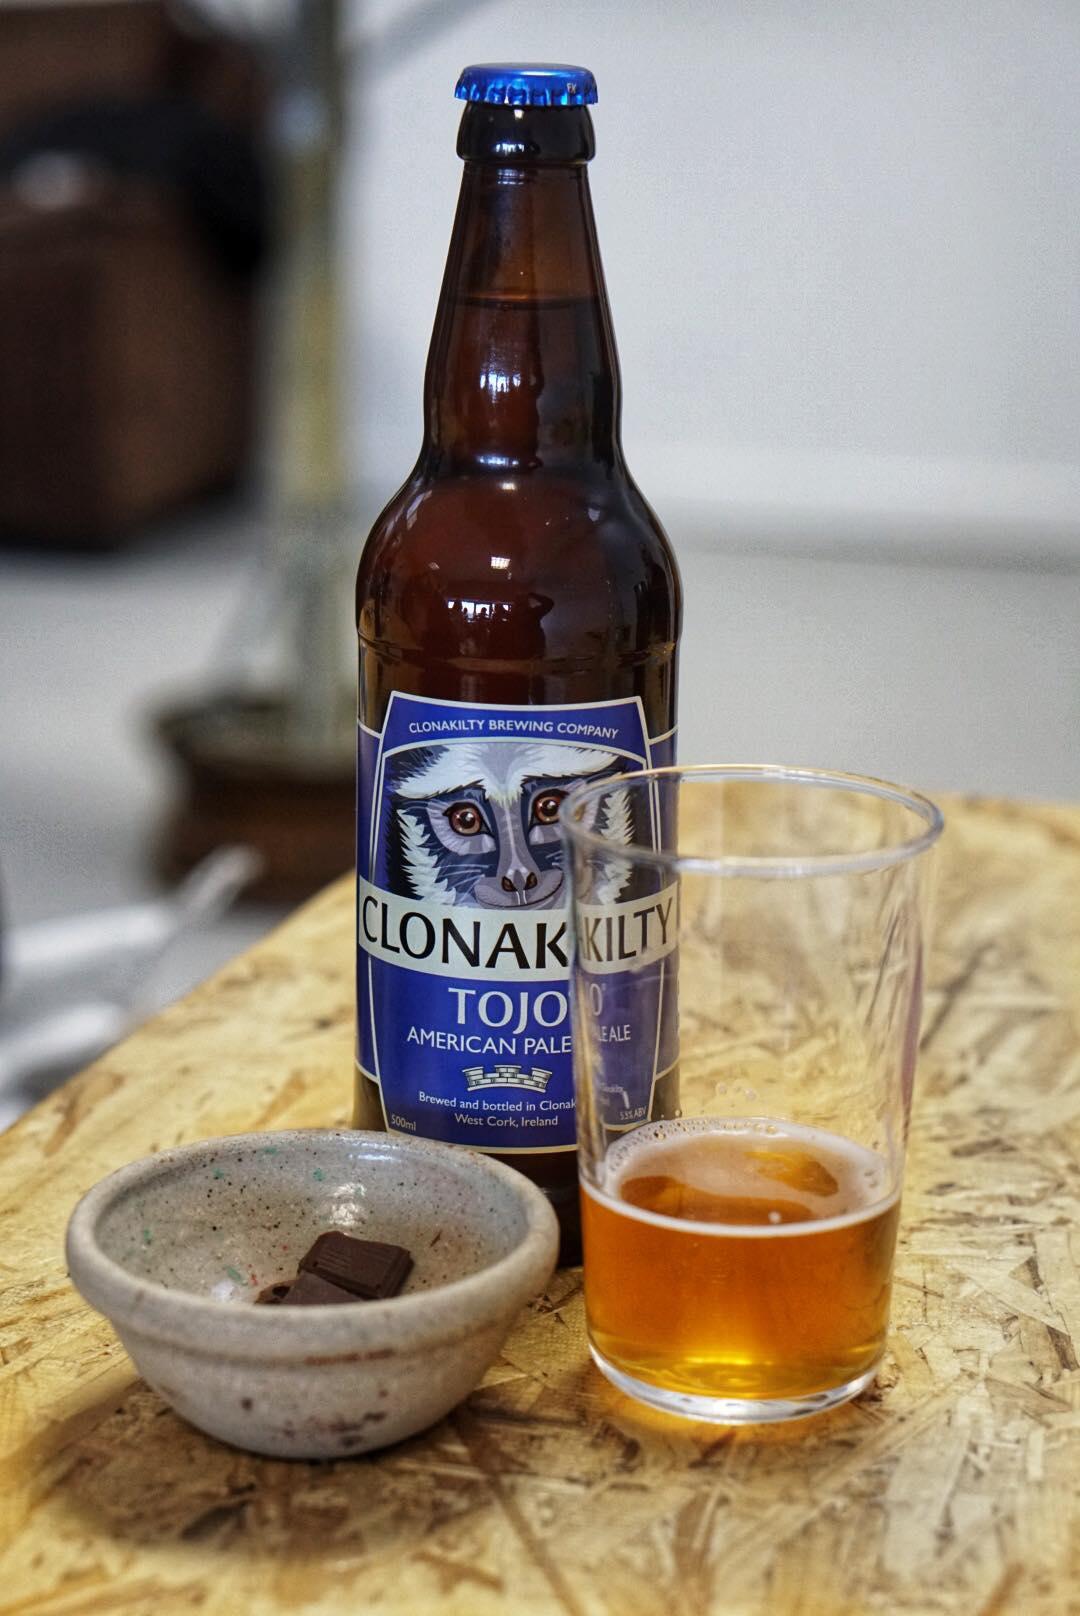 Lokaal bier en chocolade in Clonakilty. Lokaal eten in Ierland